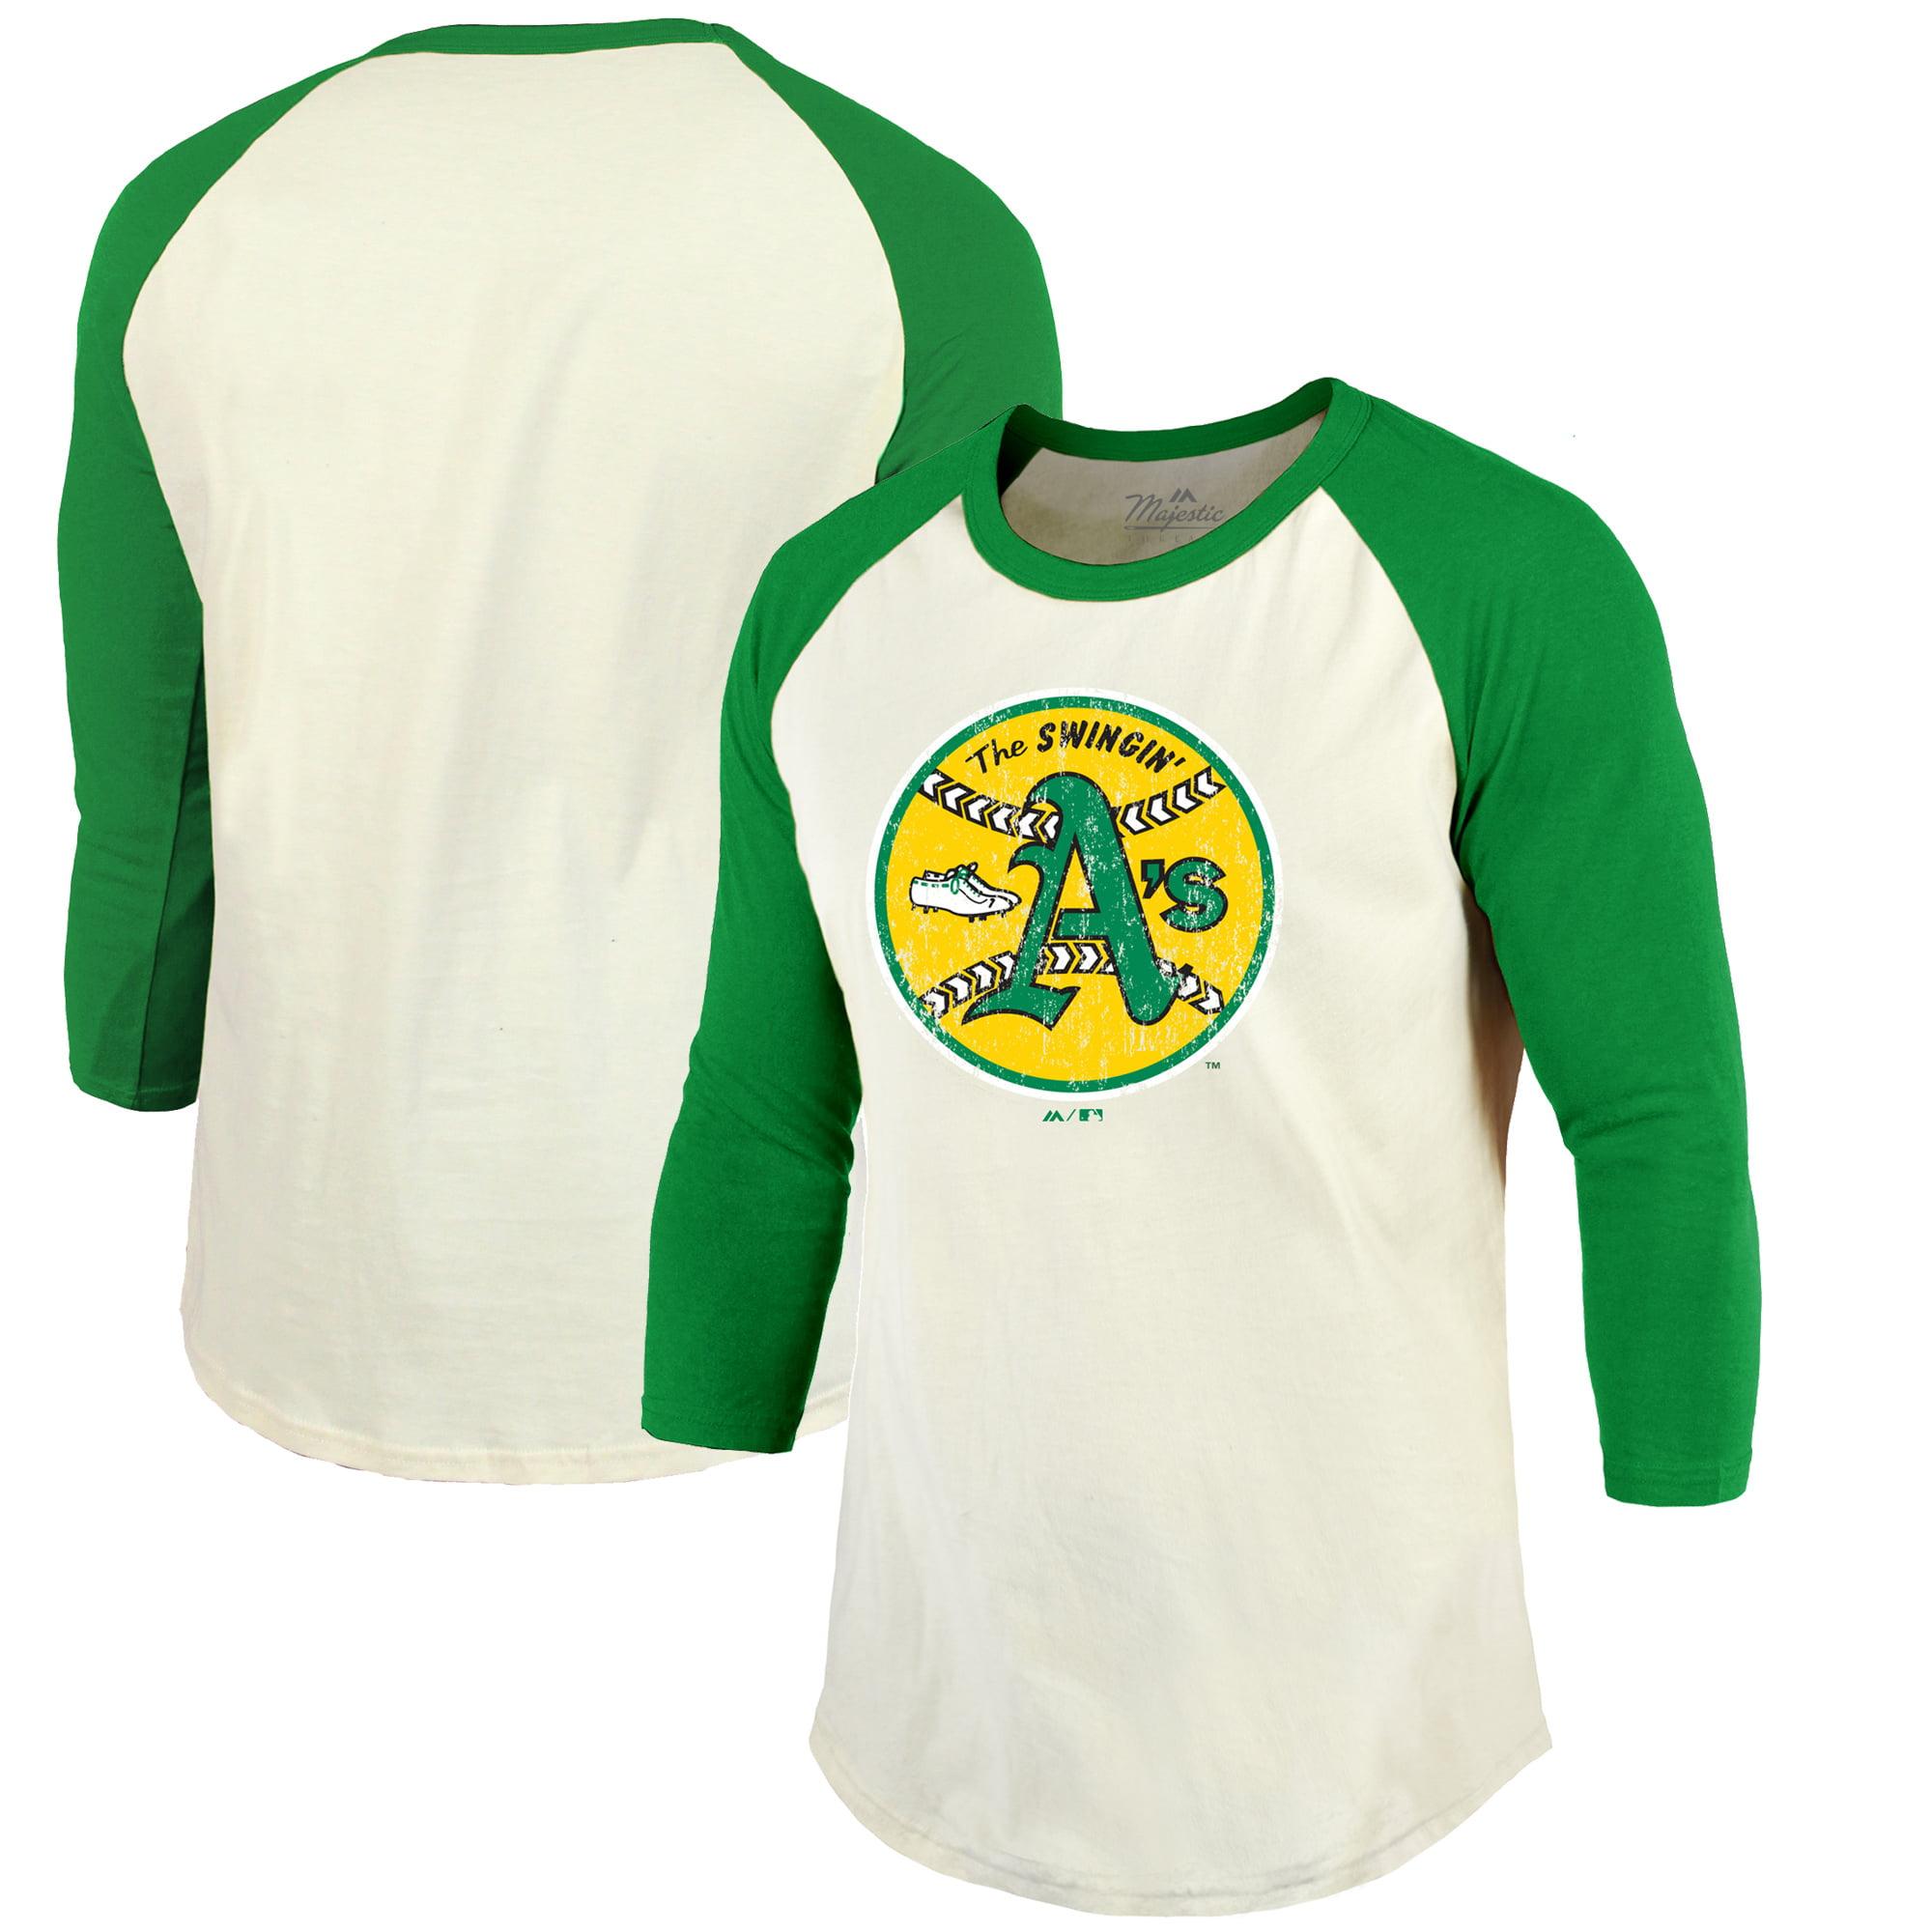 Oakland Athletics Majestic Threads Cooperstown Collection Raglan 3/4-Sleeve T-Shirt - Cream/Green